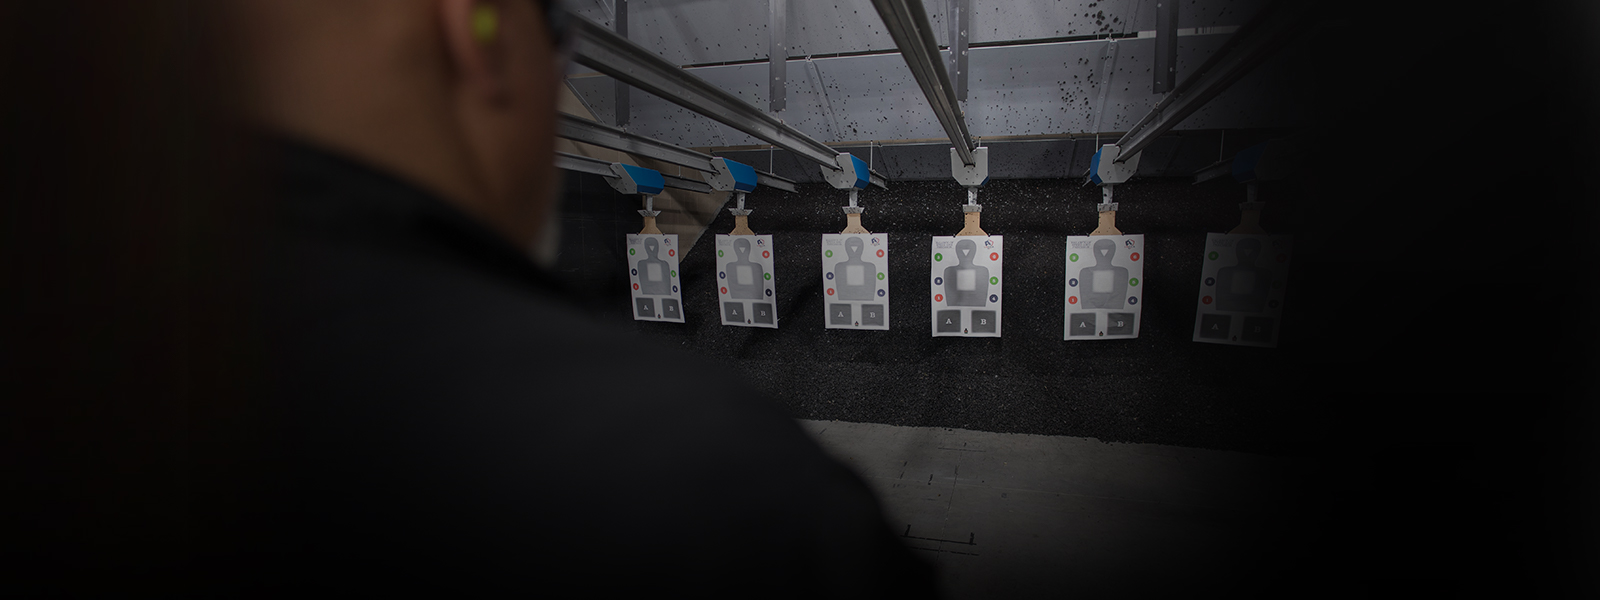 Mastering Your Handgun Confidence: Essentials of Ownership & Marksmanship